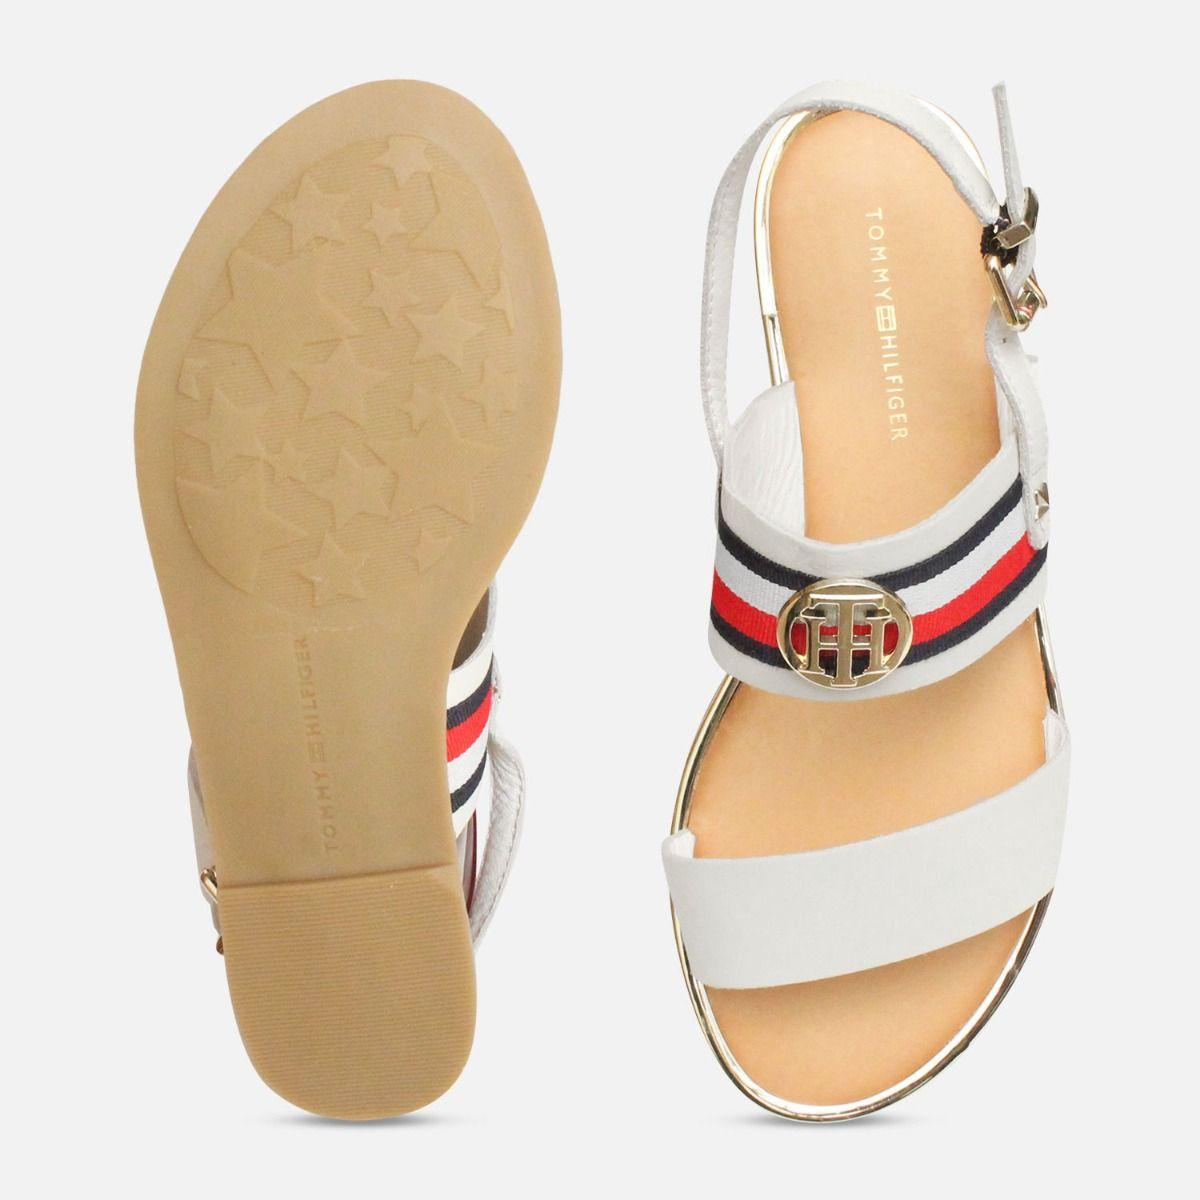 Tommy Hilfiger White Summer Sandals with Gold Trim